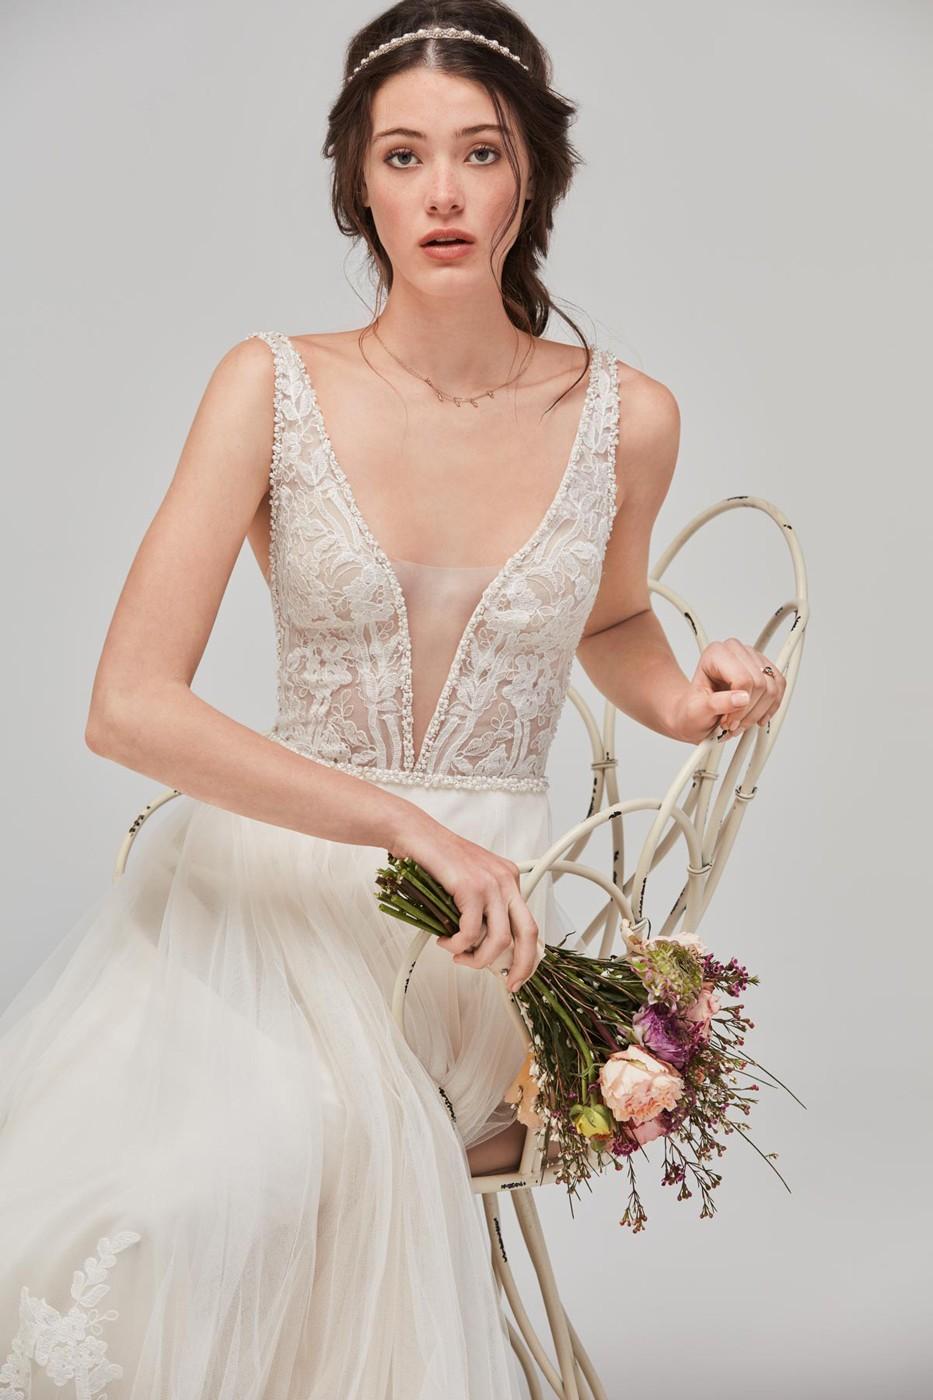 ivory-and-beau-savannah-weddings-bridal-boutique-bridal-shop-willowby-59706-philomena-v-neckline-bridal-dress-03.232.jpg